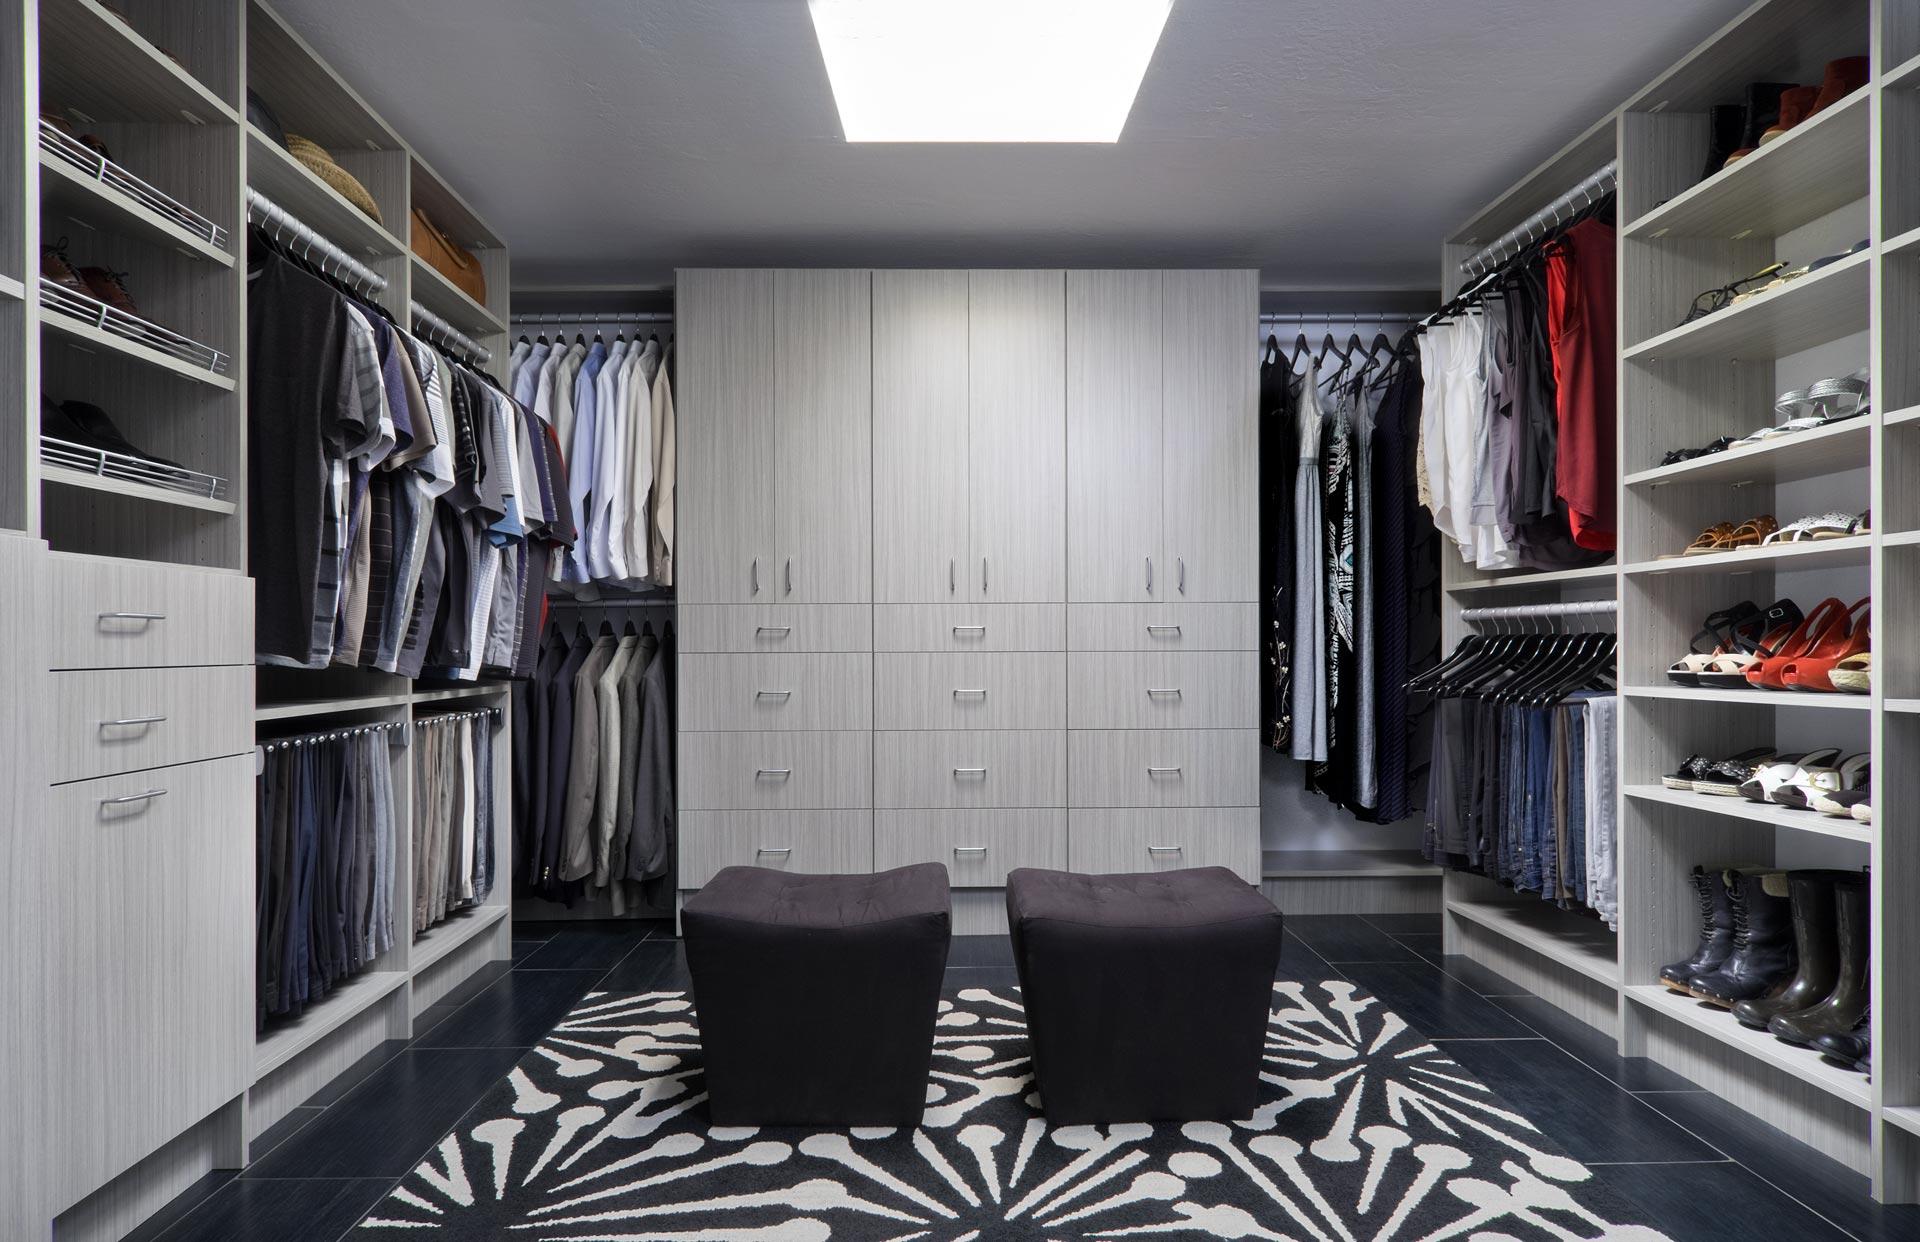 Washington Custom Closet Organizers & Garage Storage Systems